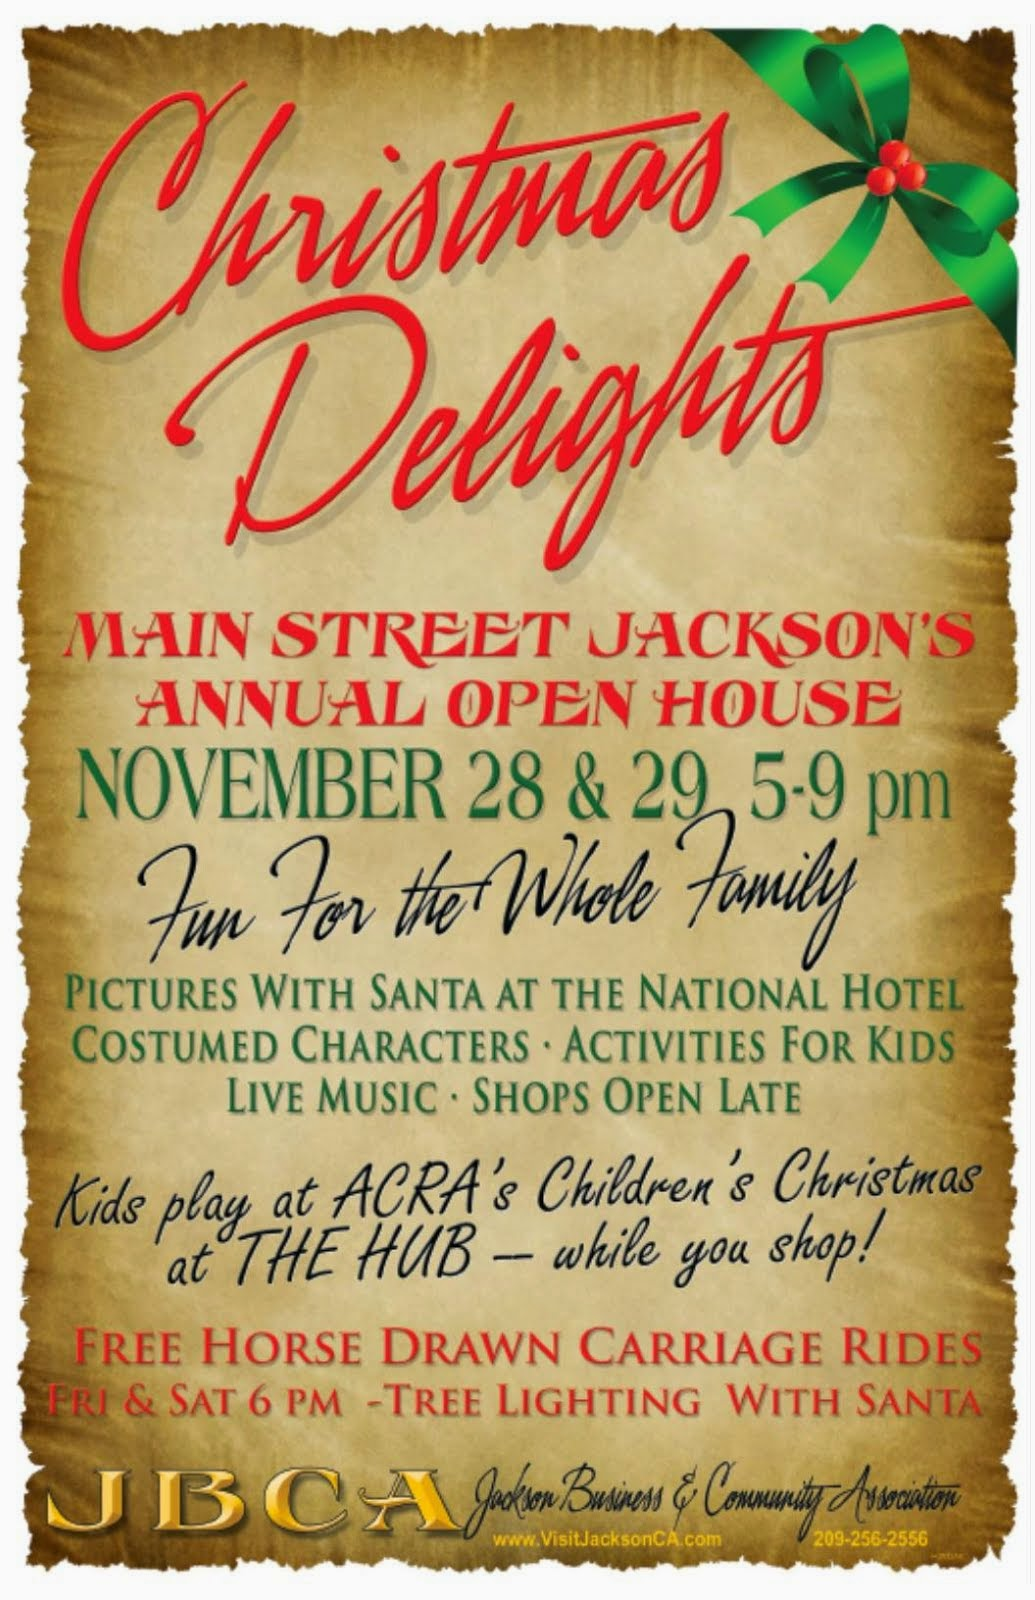 Christmas Delights - Nov 28 & 29